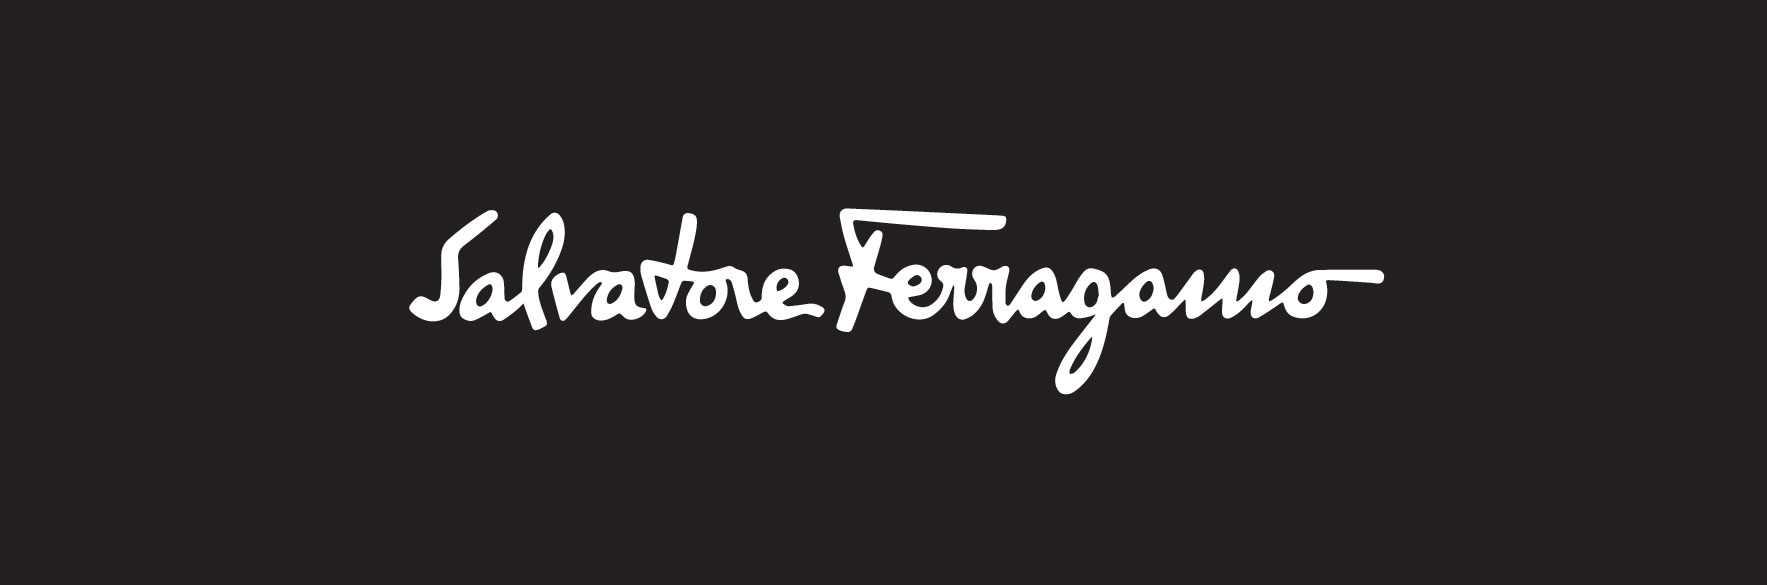 سالواتوره فراگامو